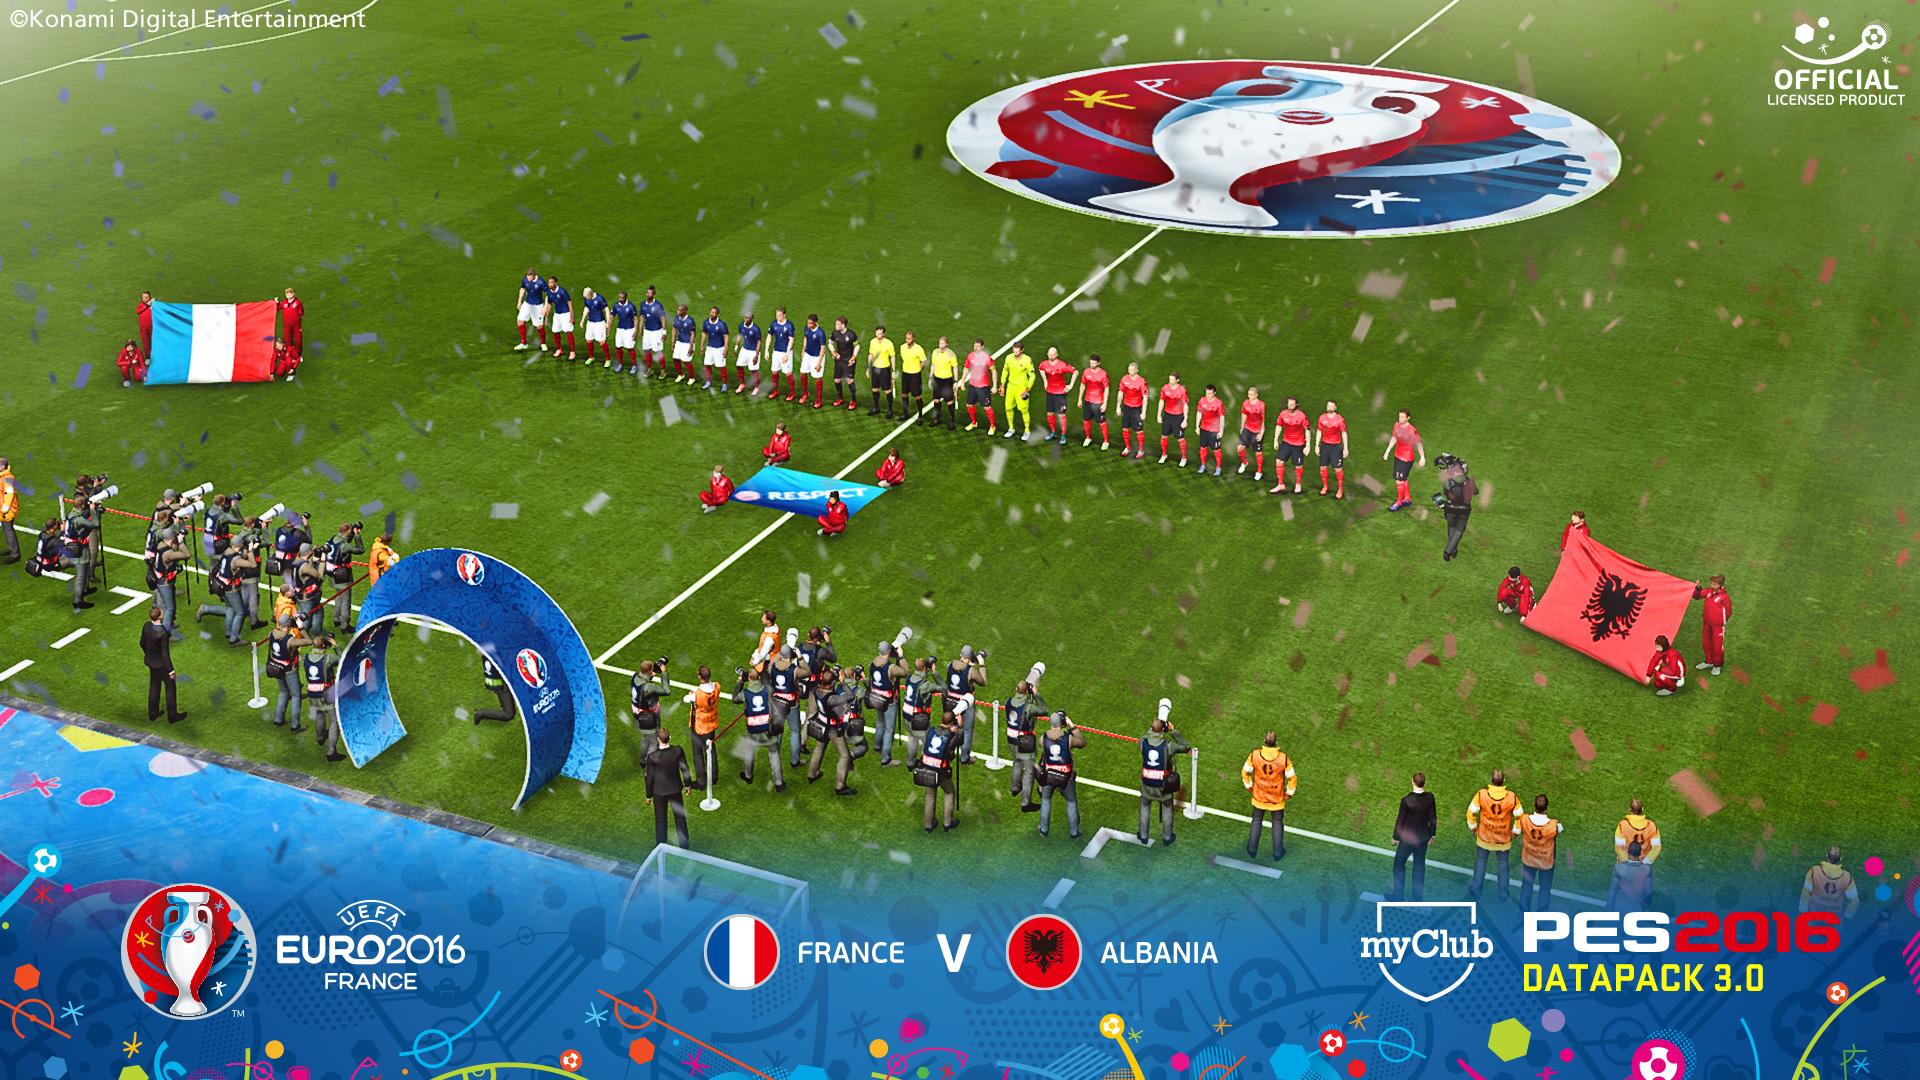 PES2016-DP3_France-v-Albania-02